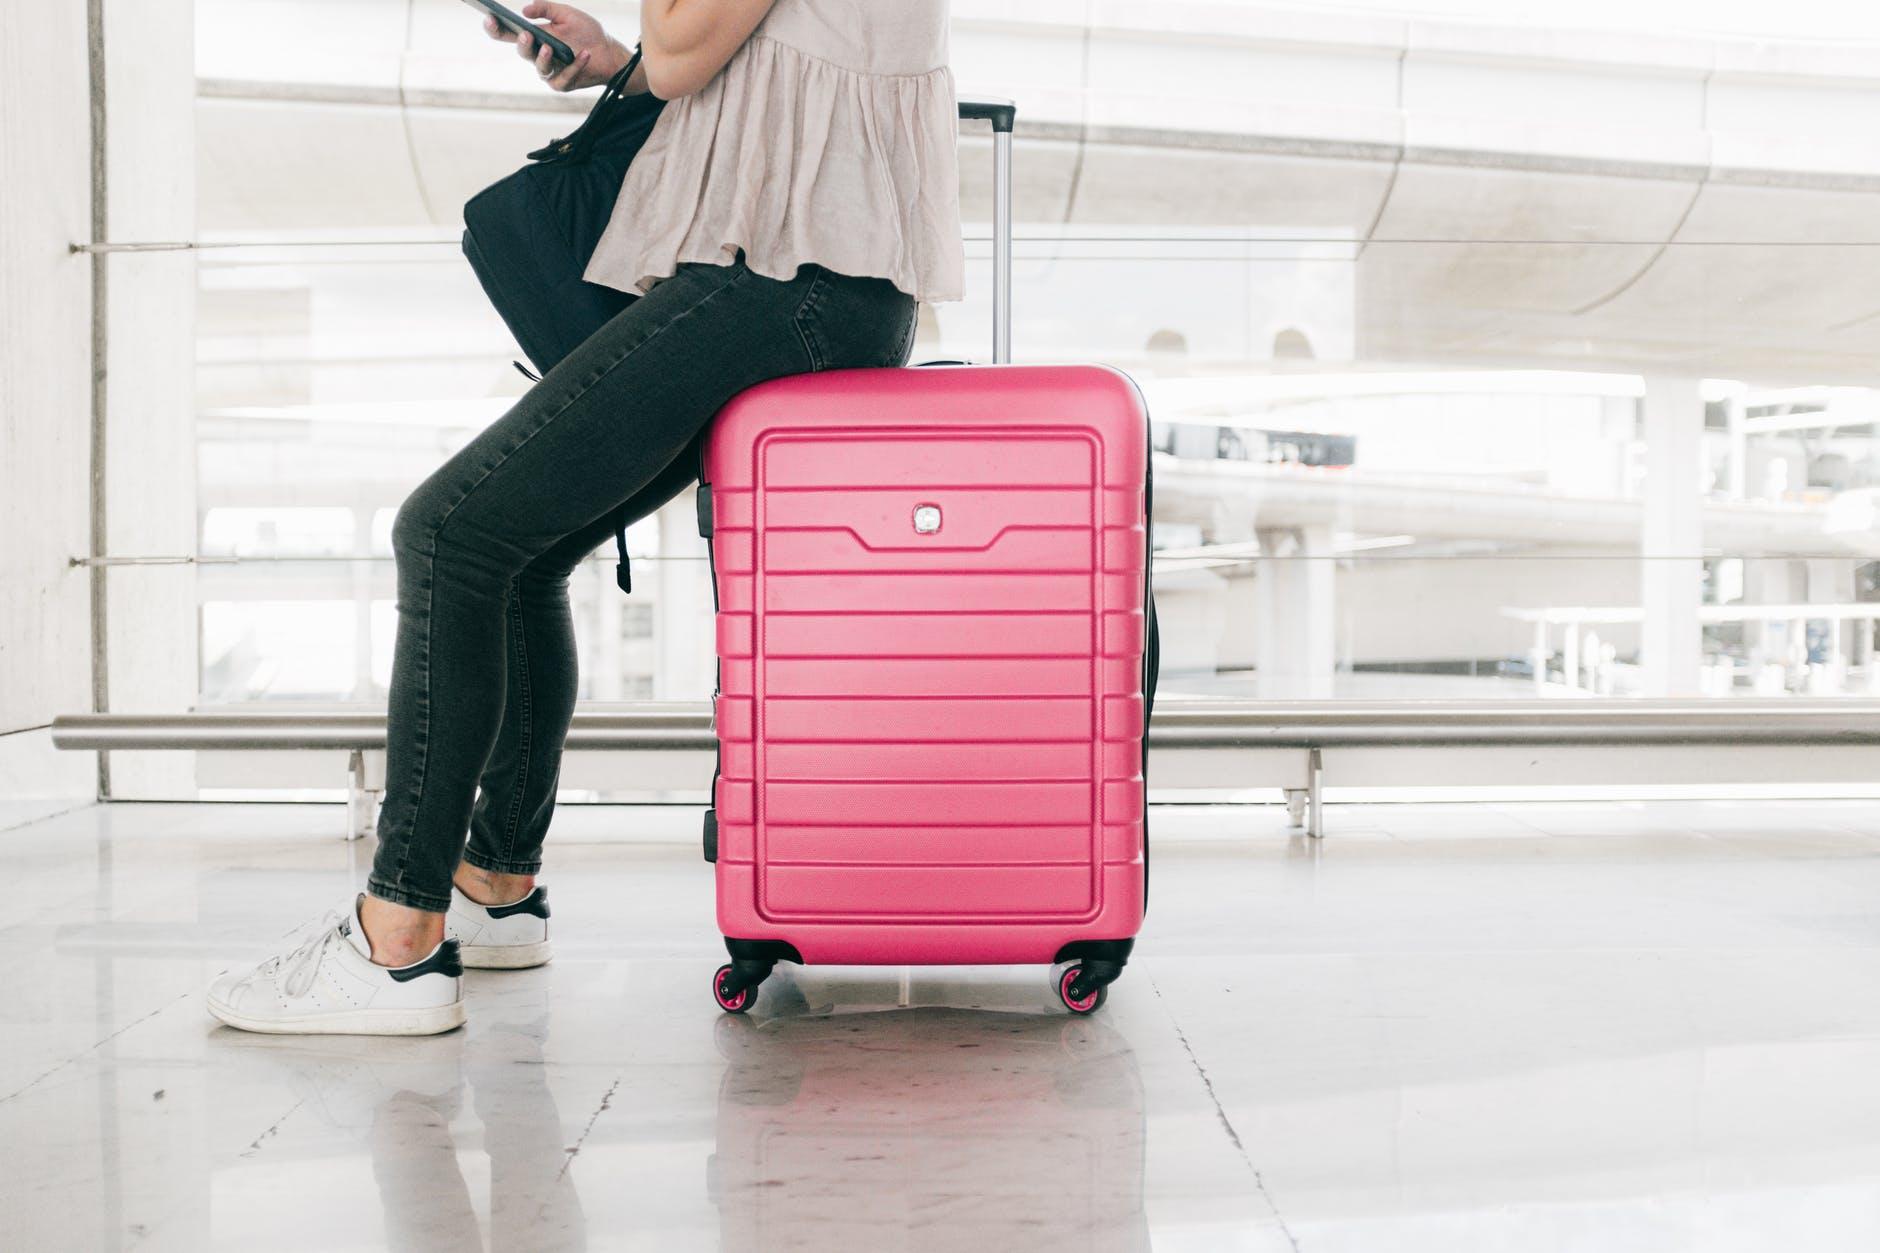 zip money luggage